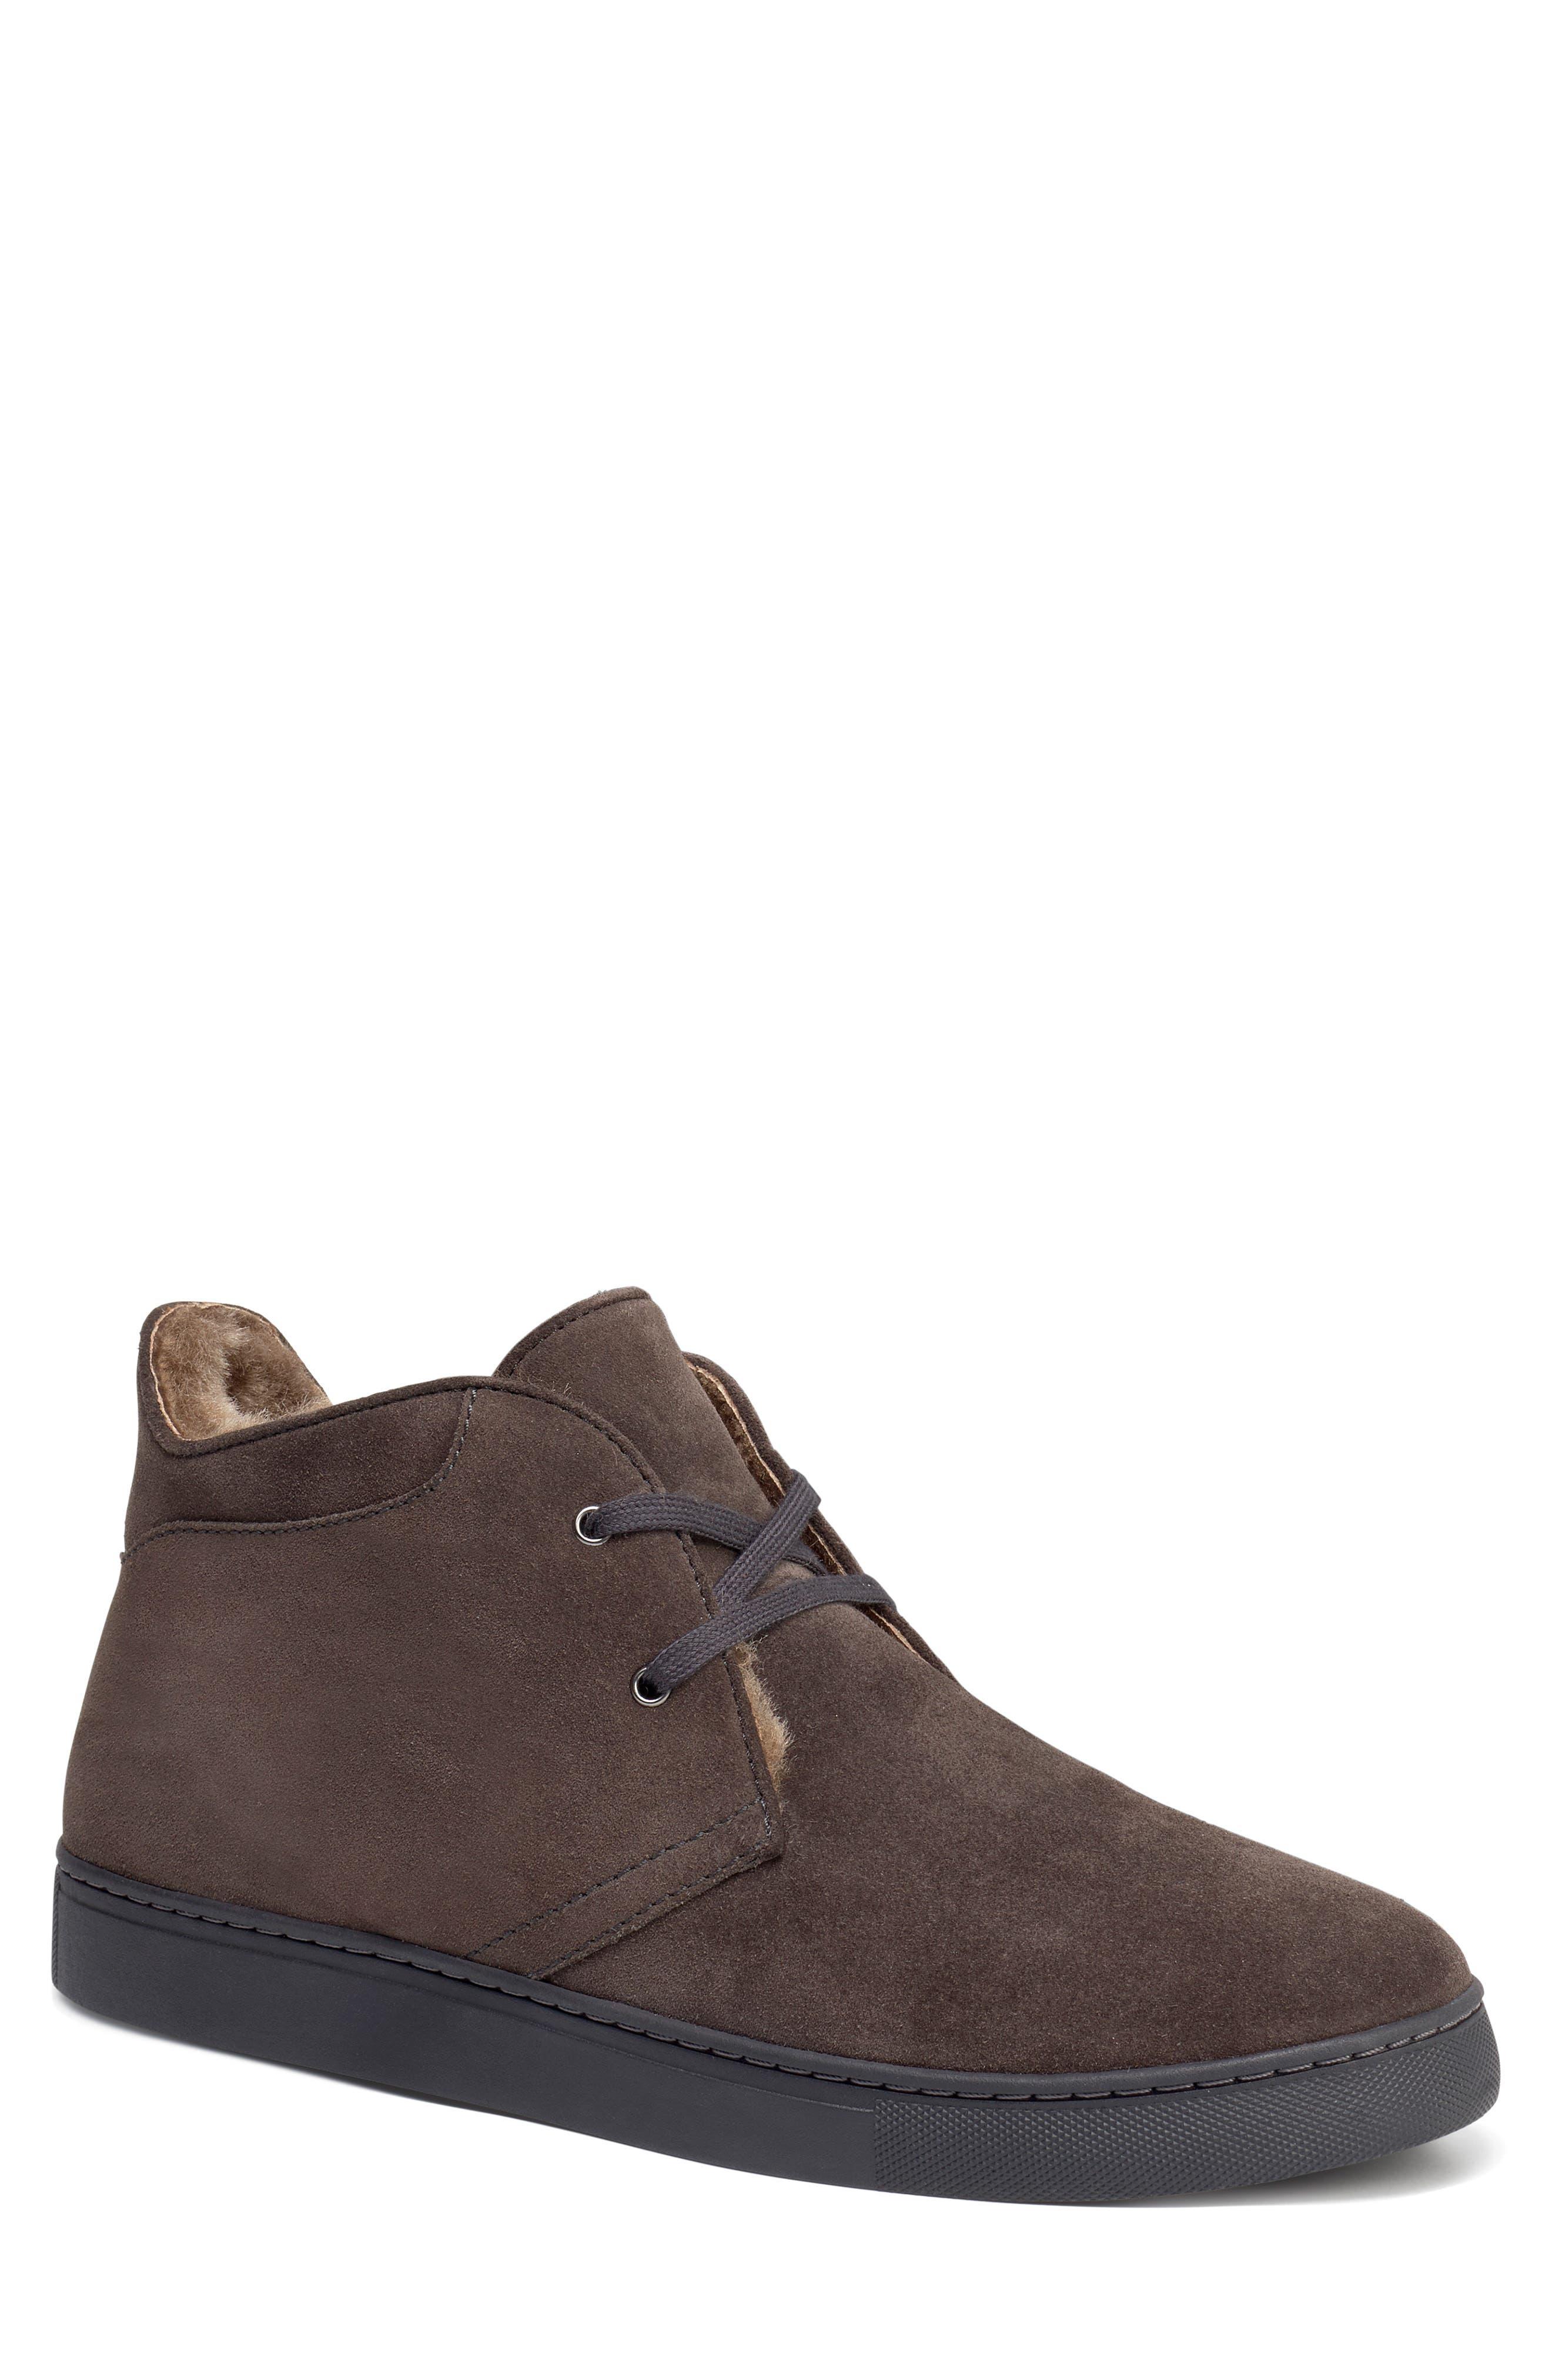 Trask Ariston Genuine Shearling Chukka Boot, Grey